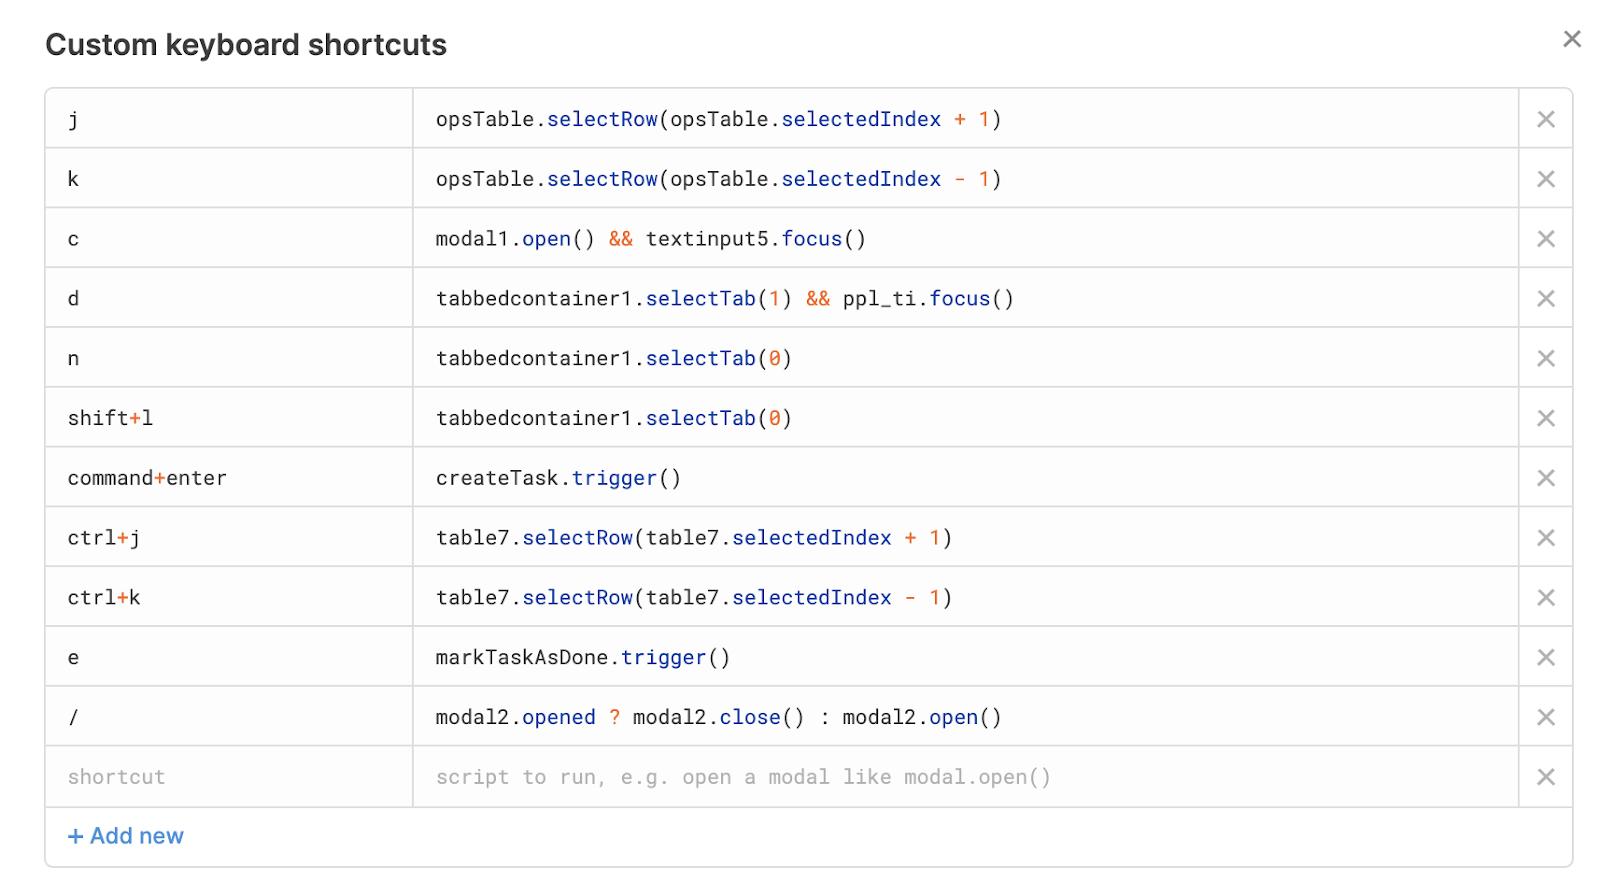 keyboard shortcuts example in Retool